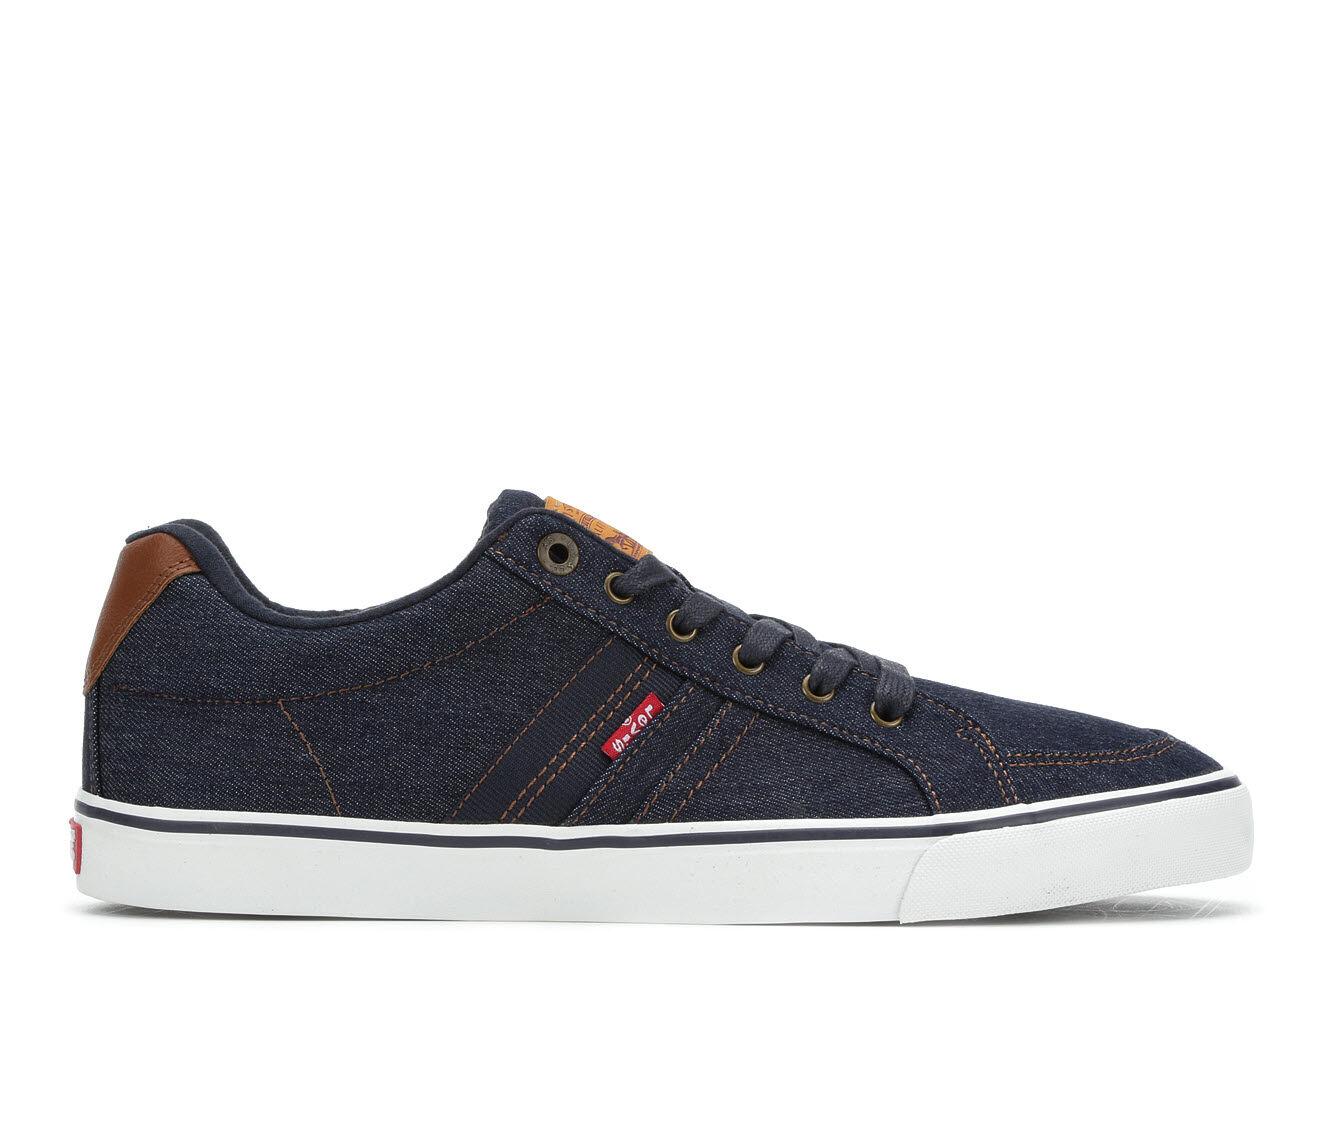 Men's Levis Turner Denim Casual Shoes Navy